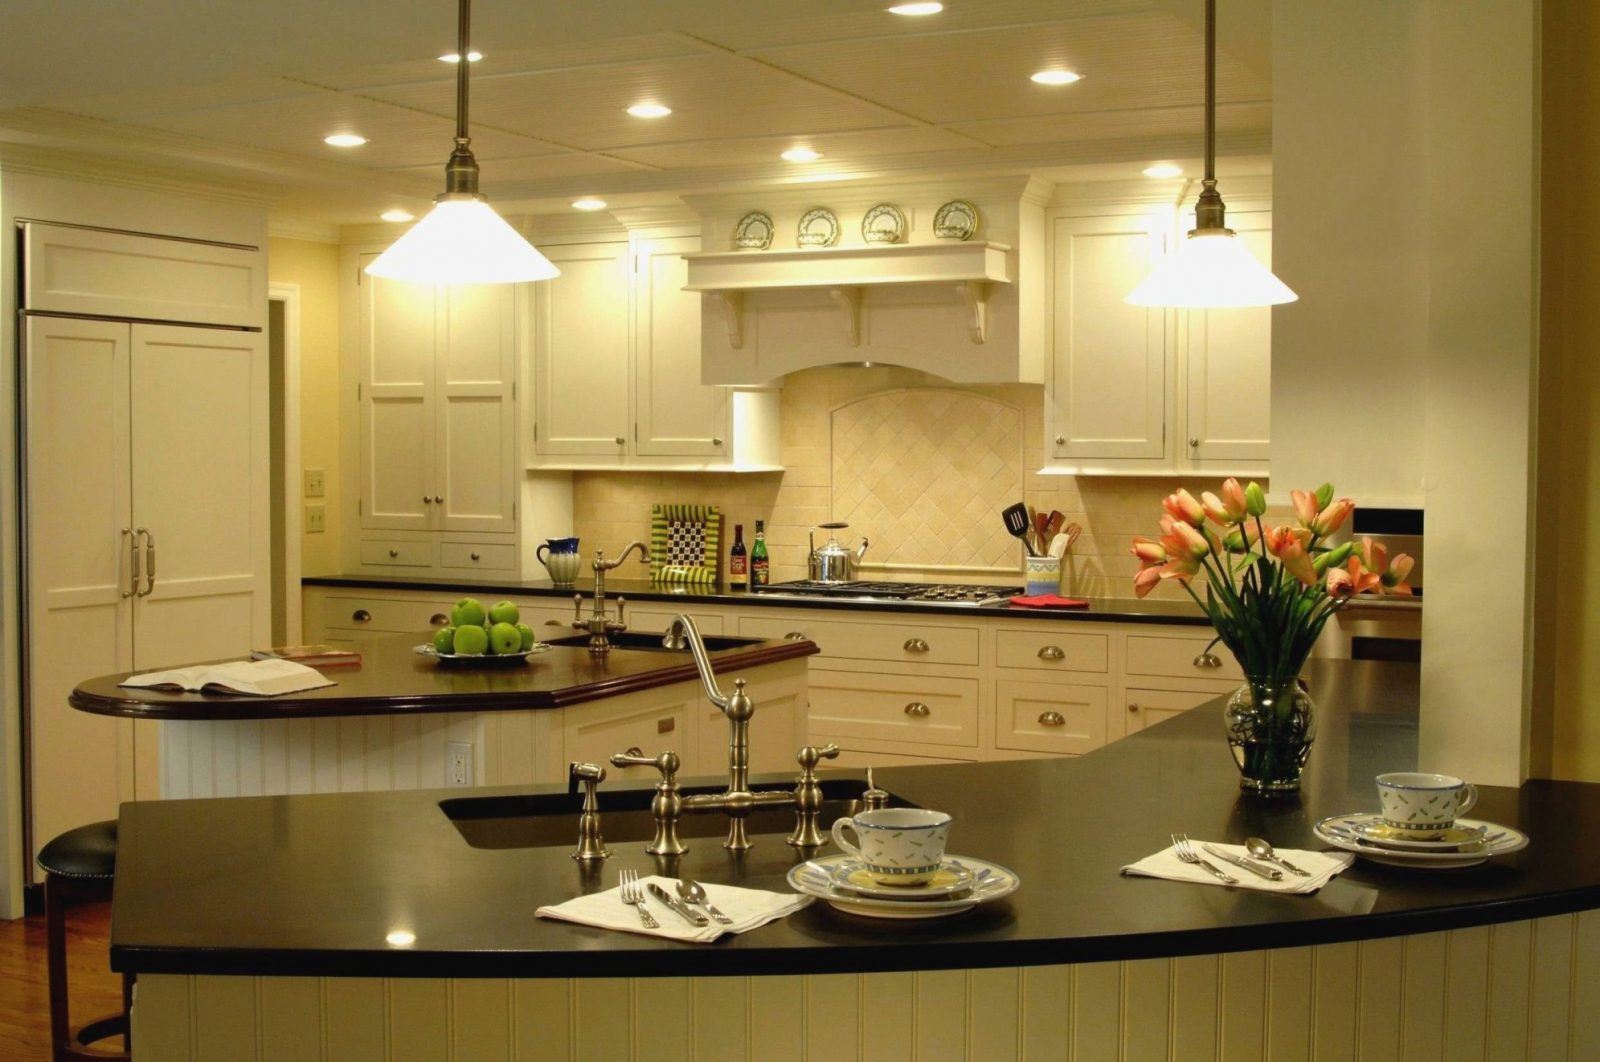 Wie Viele Led Spots Pro M2 Küche  Ostseesuche von Wie Viele Led Spots Pro M2 Photo